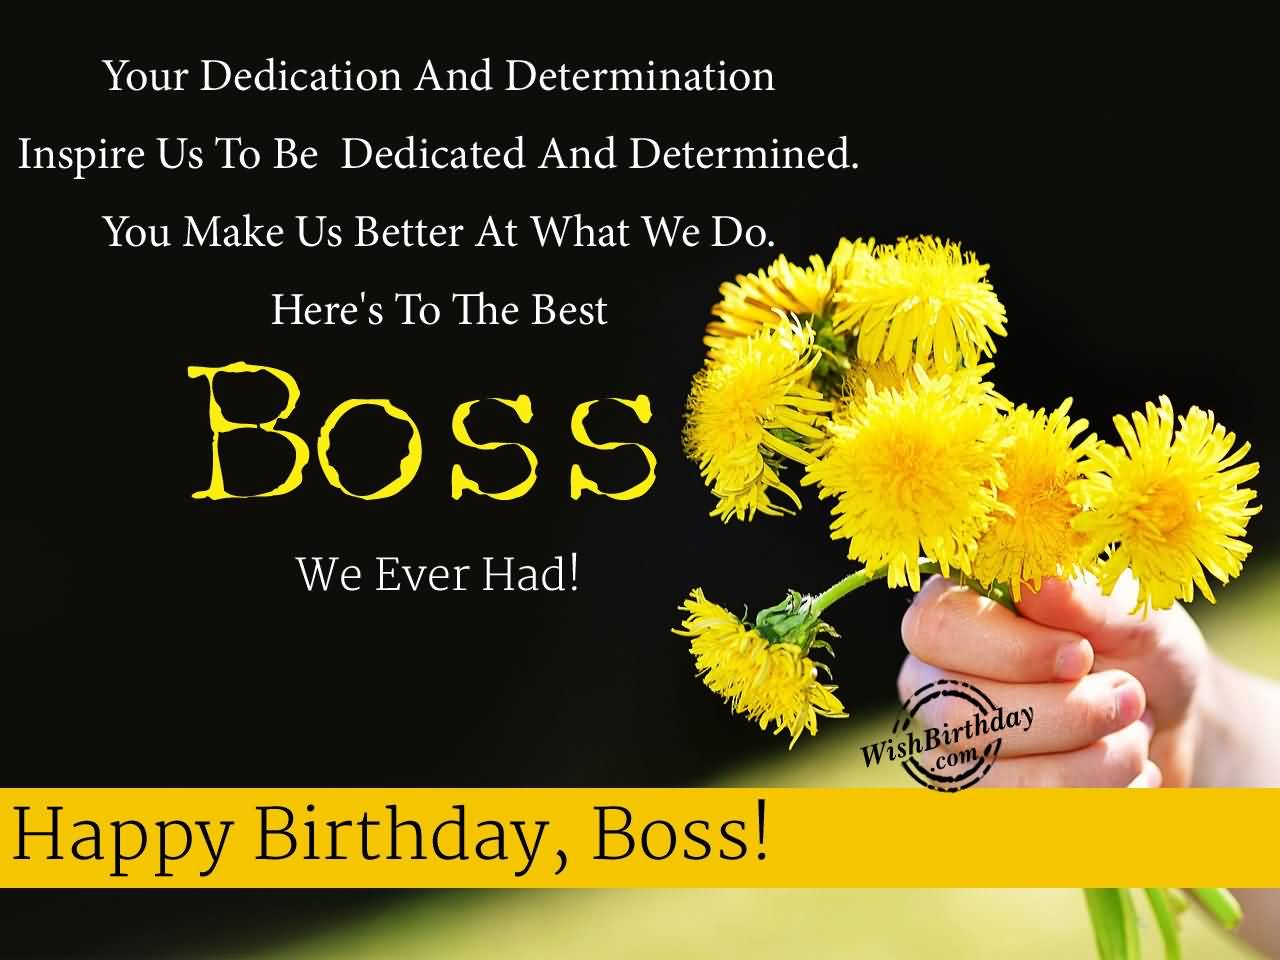 Have A Wonderful Birthday Boss Greeting Image